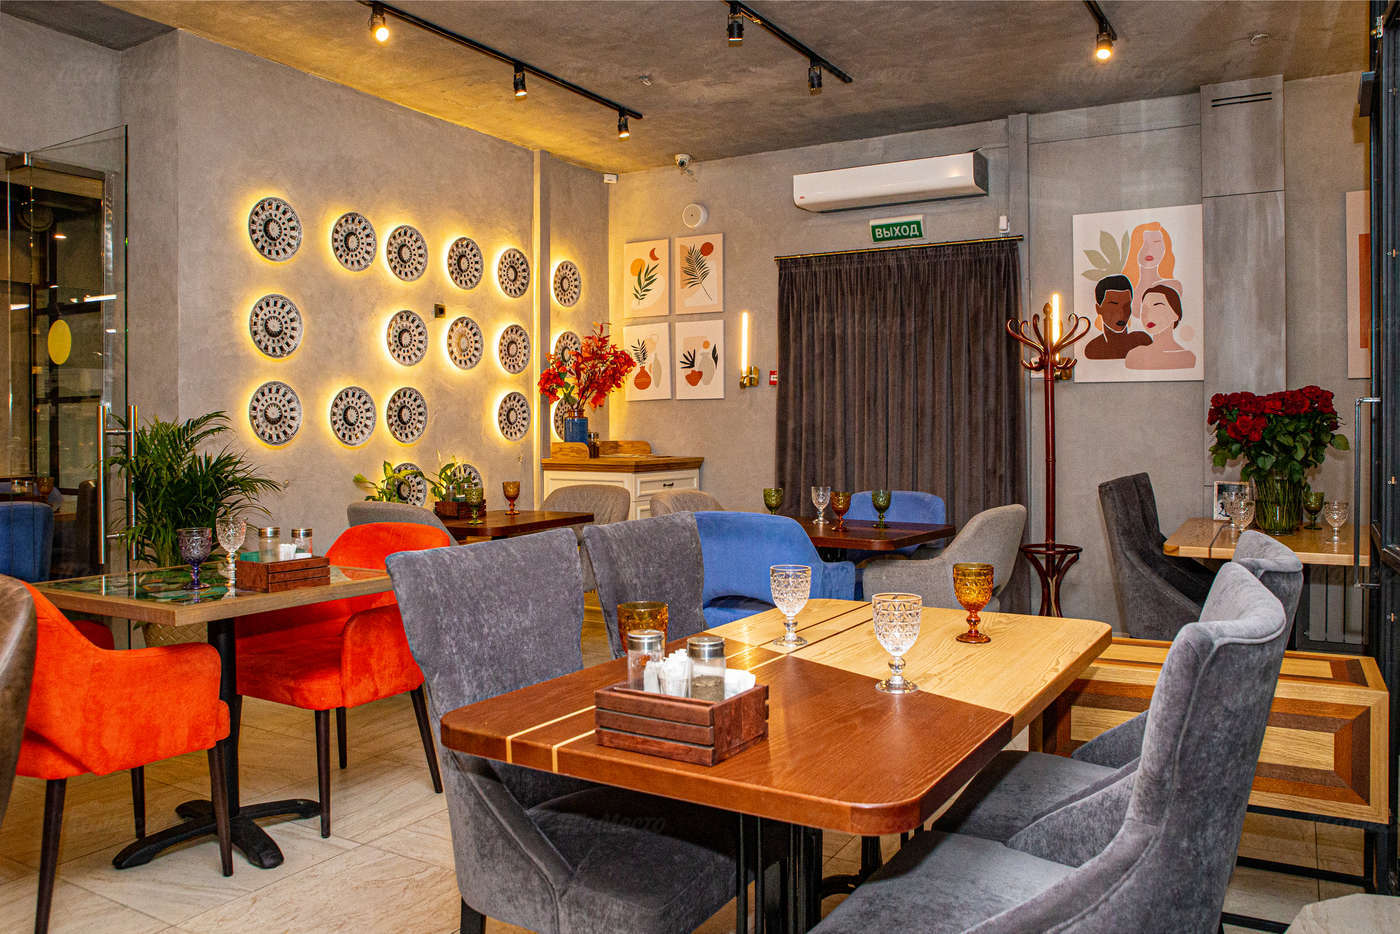 Ресторан IL LETTERATO (Литератор) в Петроверигском переулке фото 30